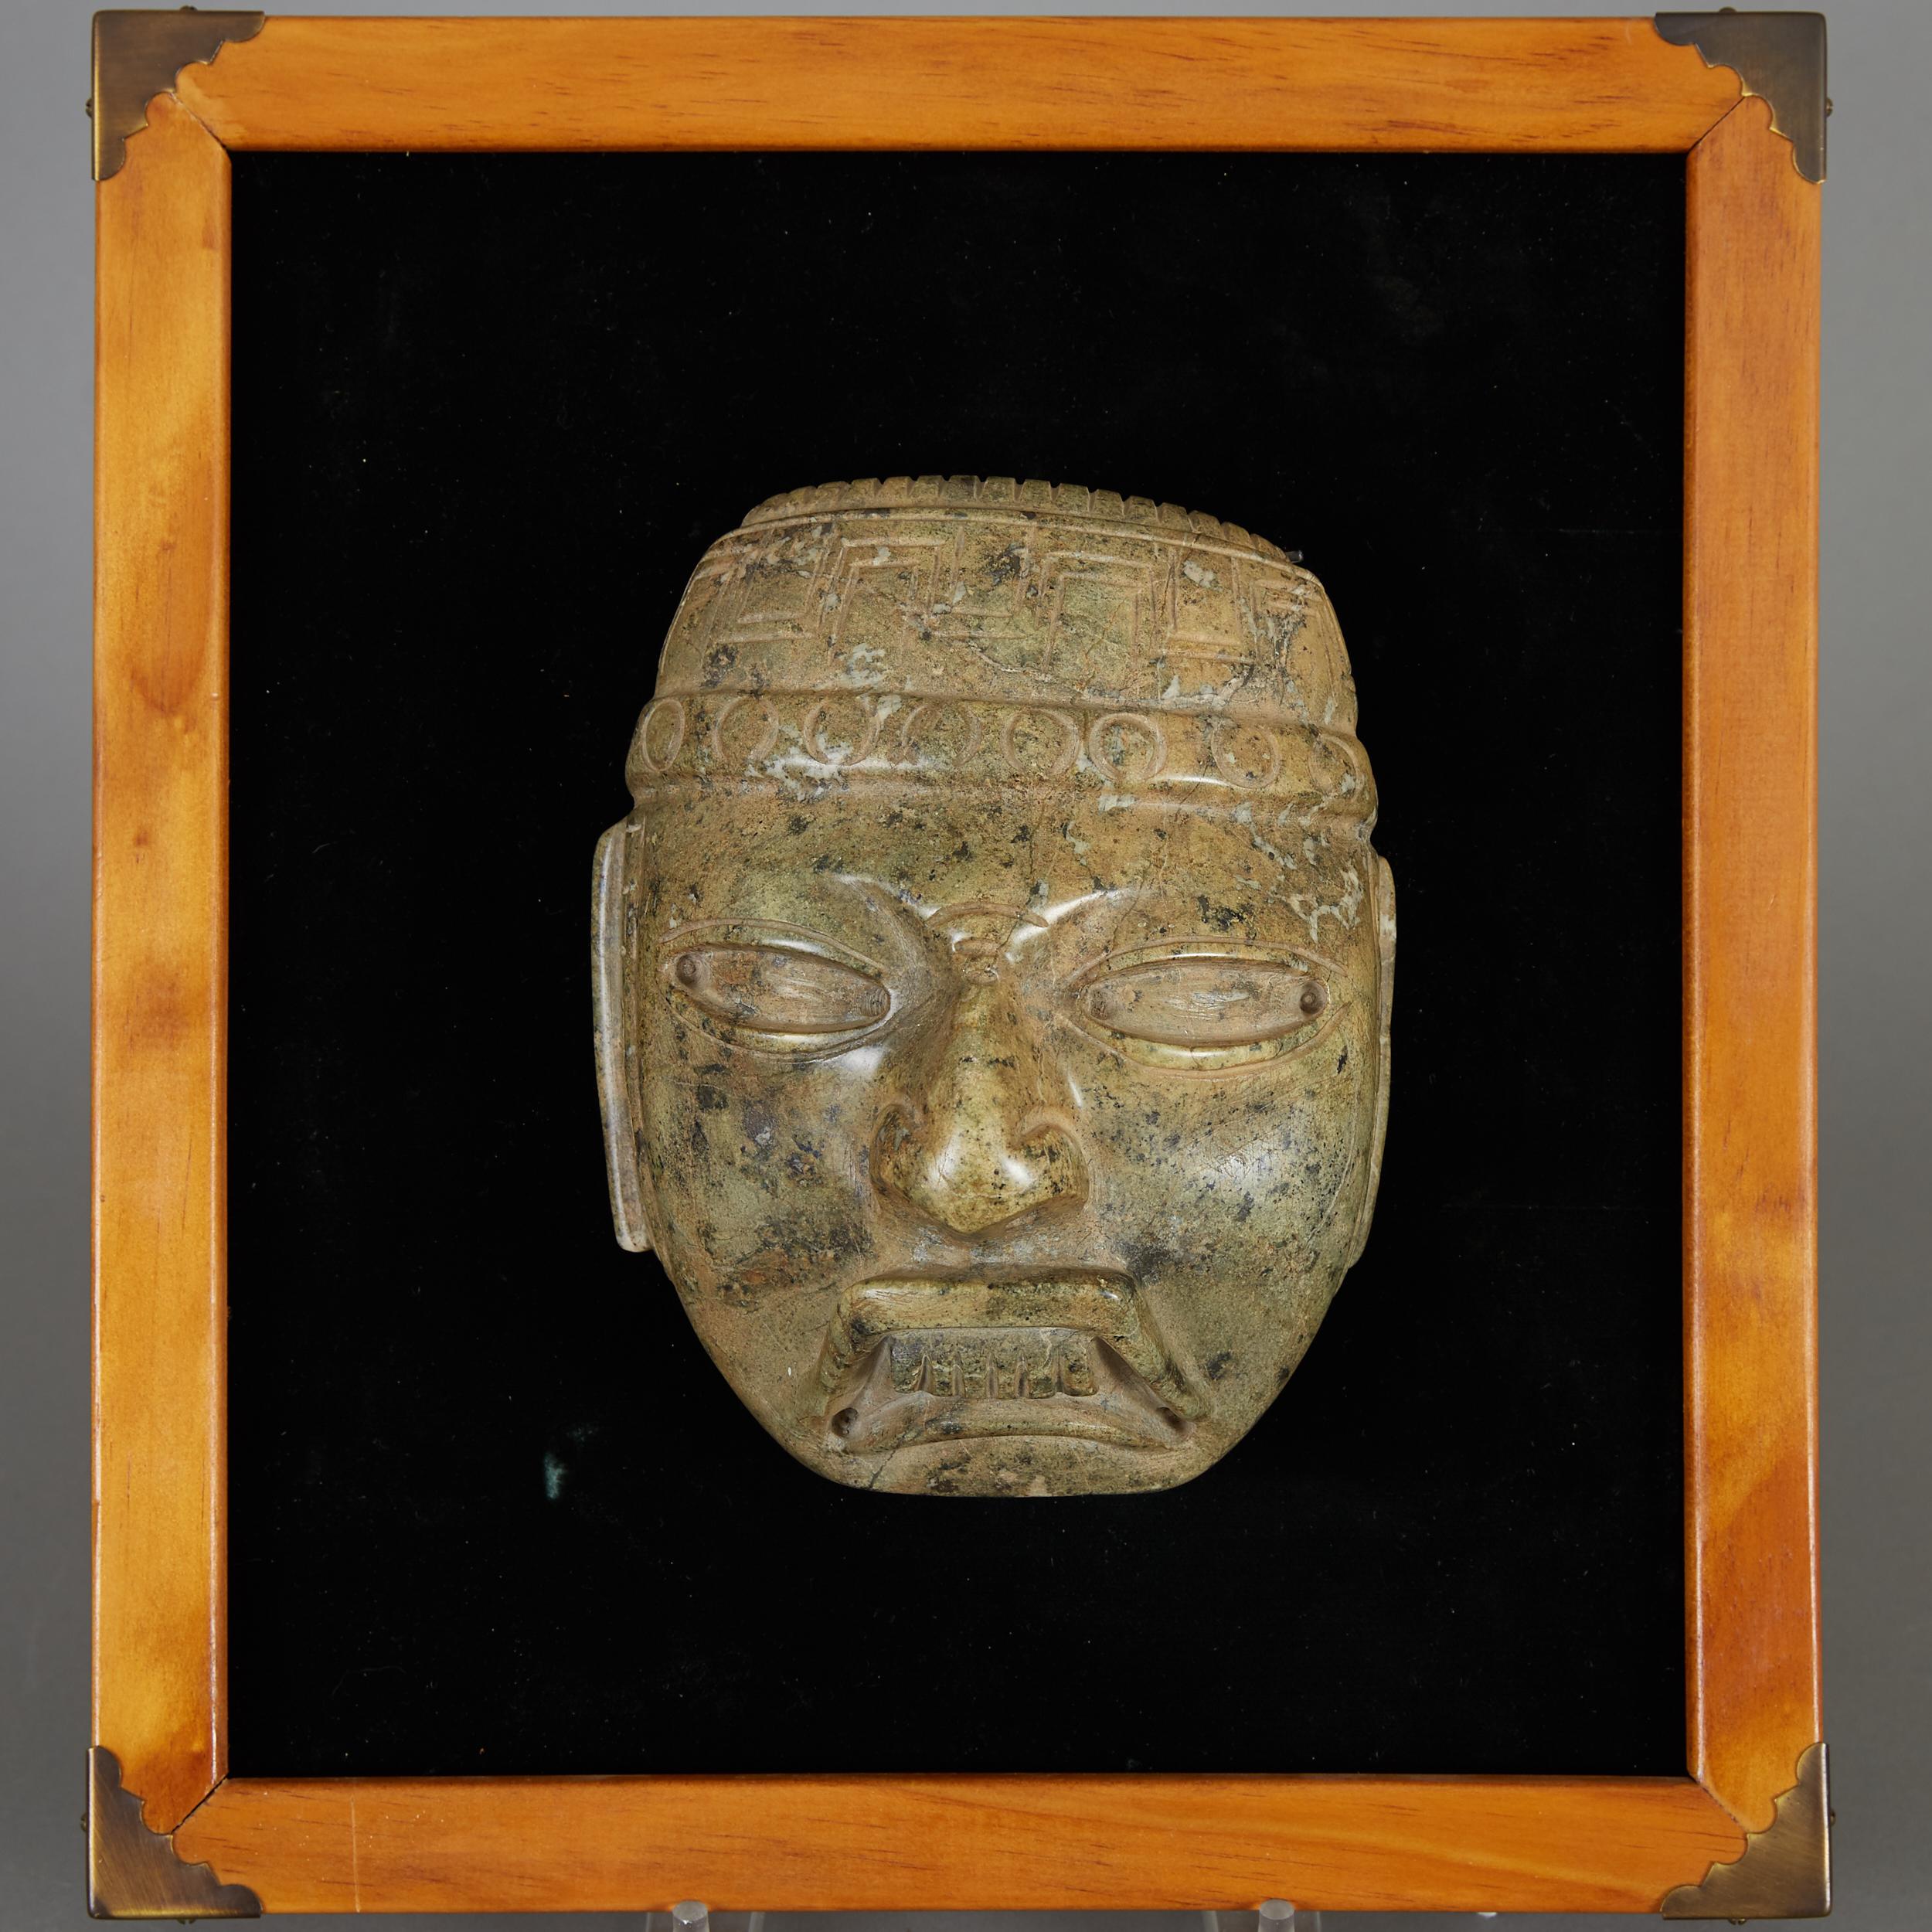 Lot 190 - Pre-Columbian Olmec Mask